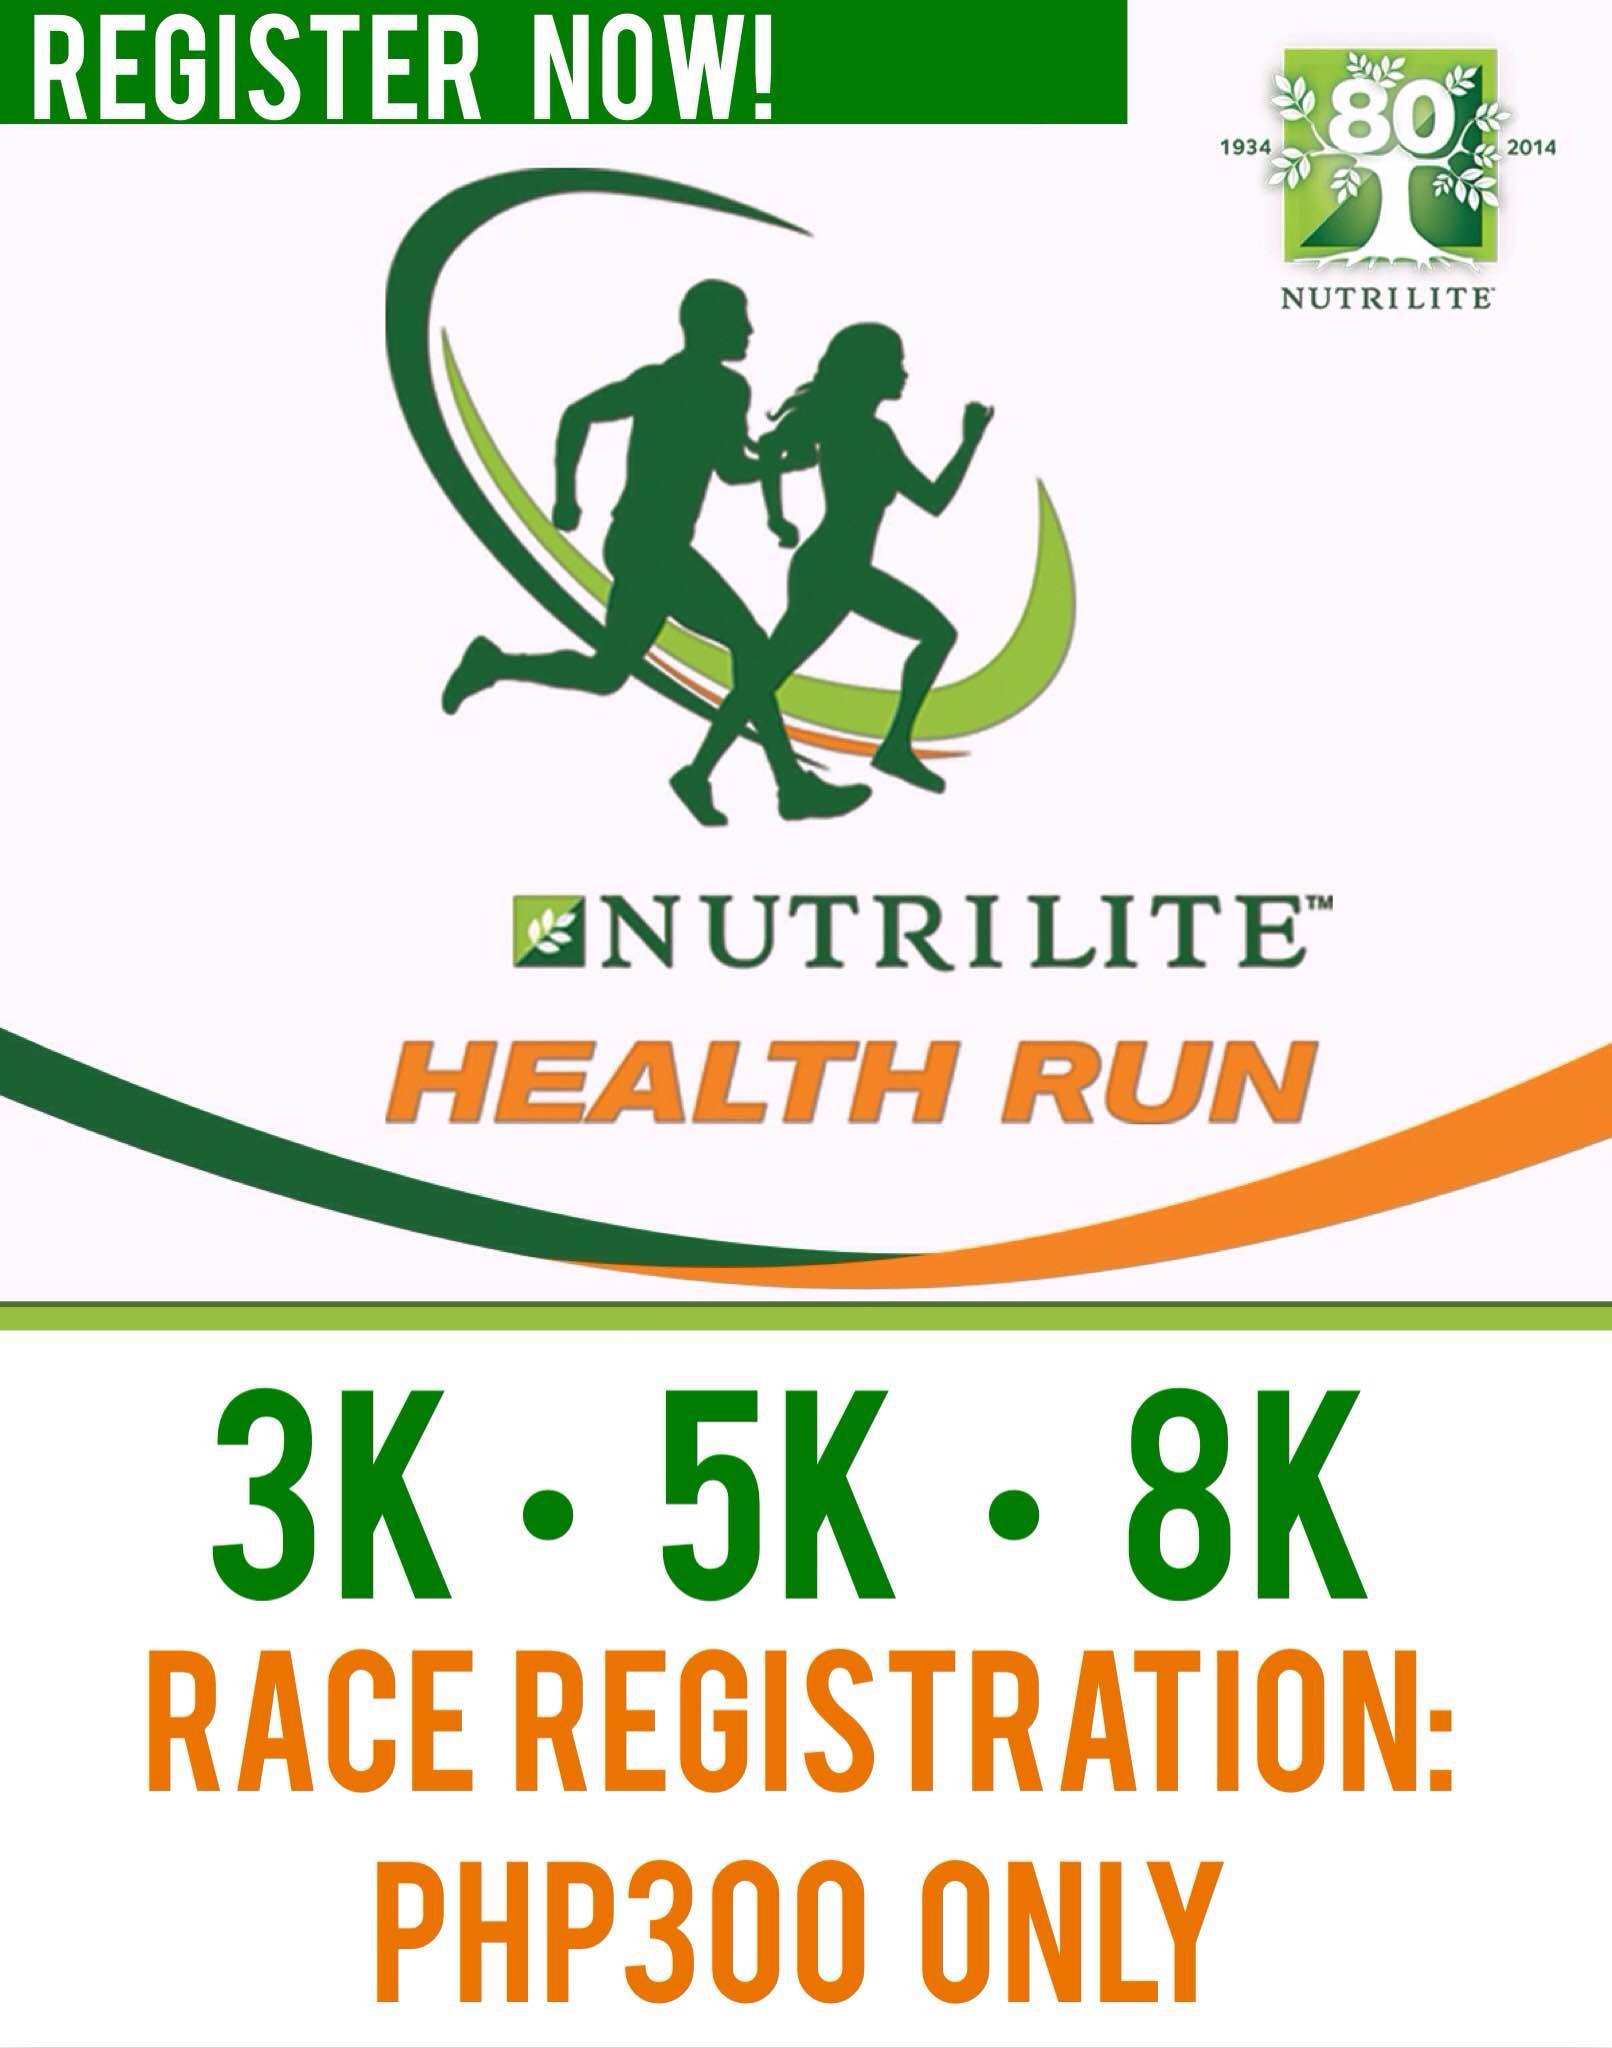 Amway Nutrilite Health Run 2015 in CDO 2